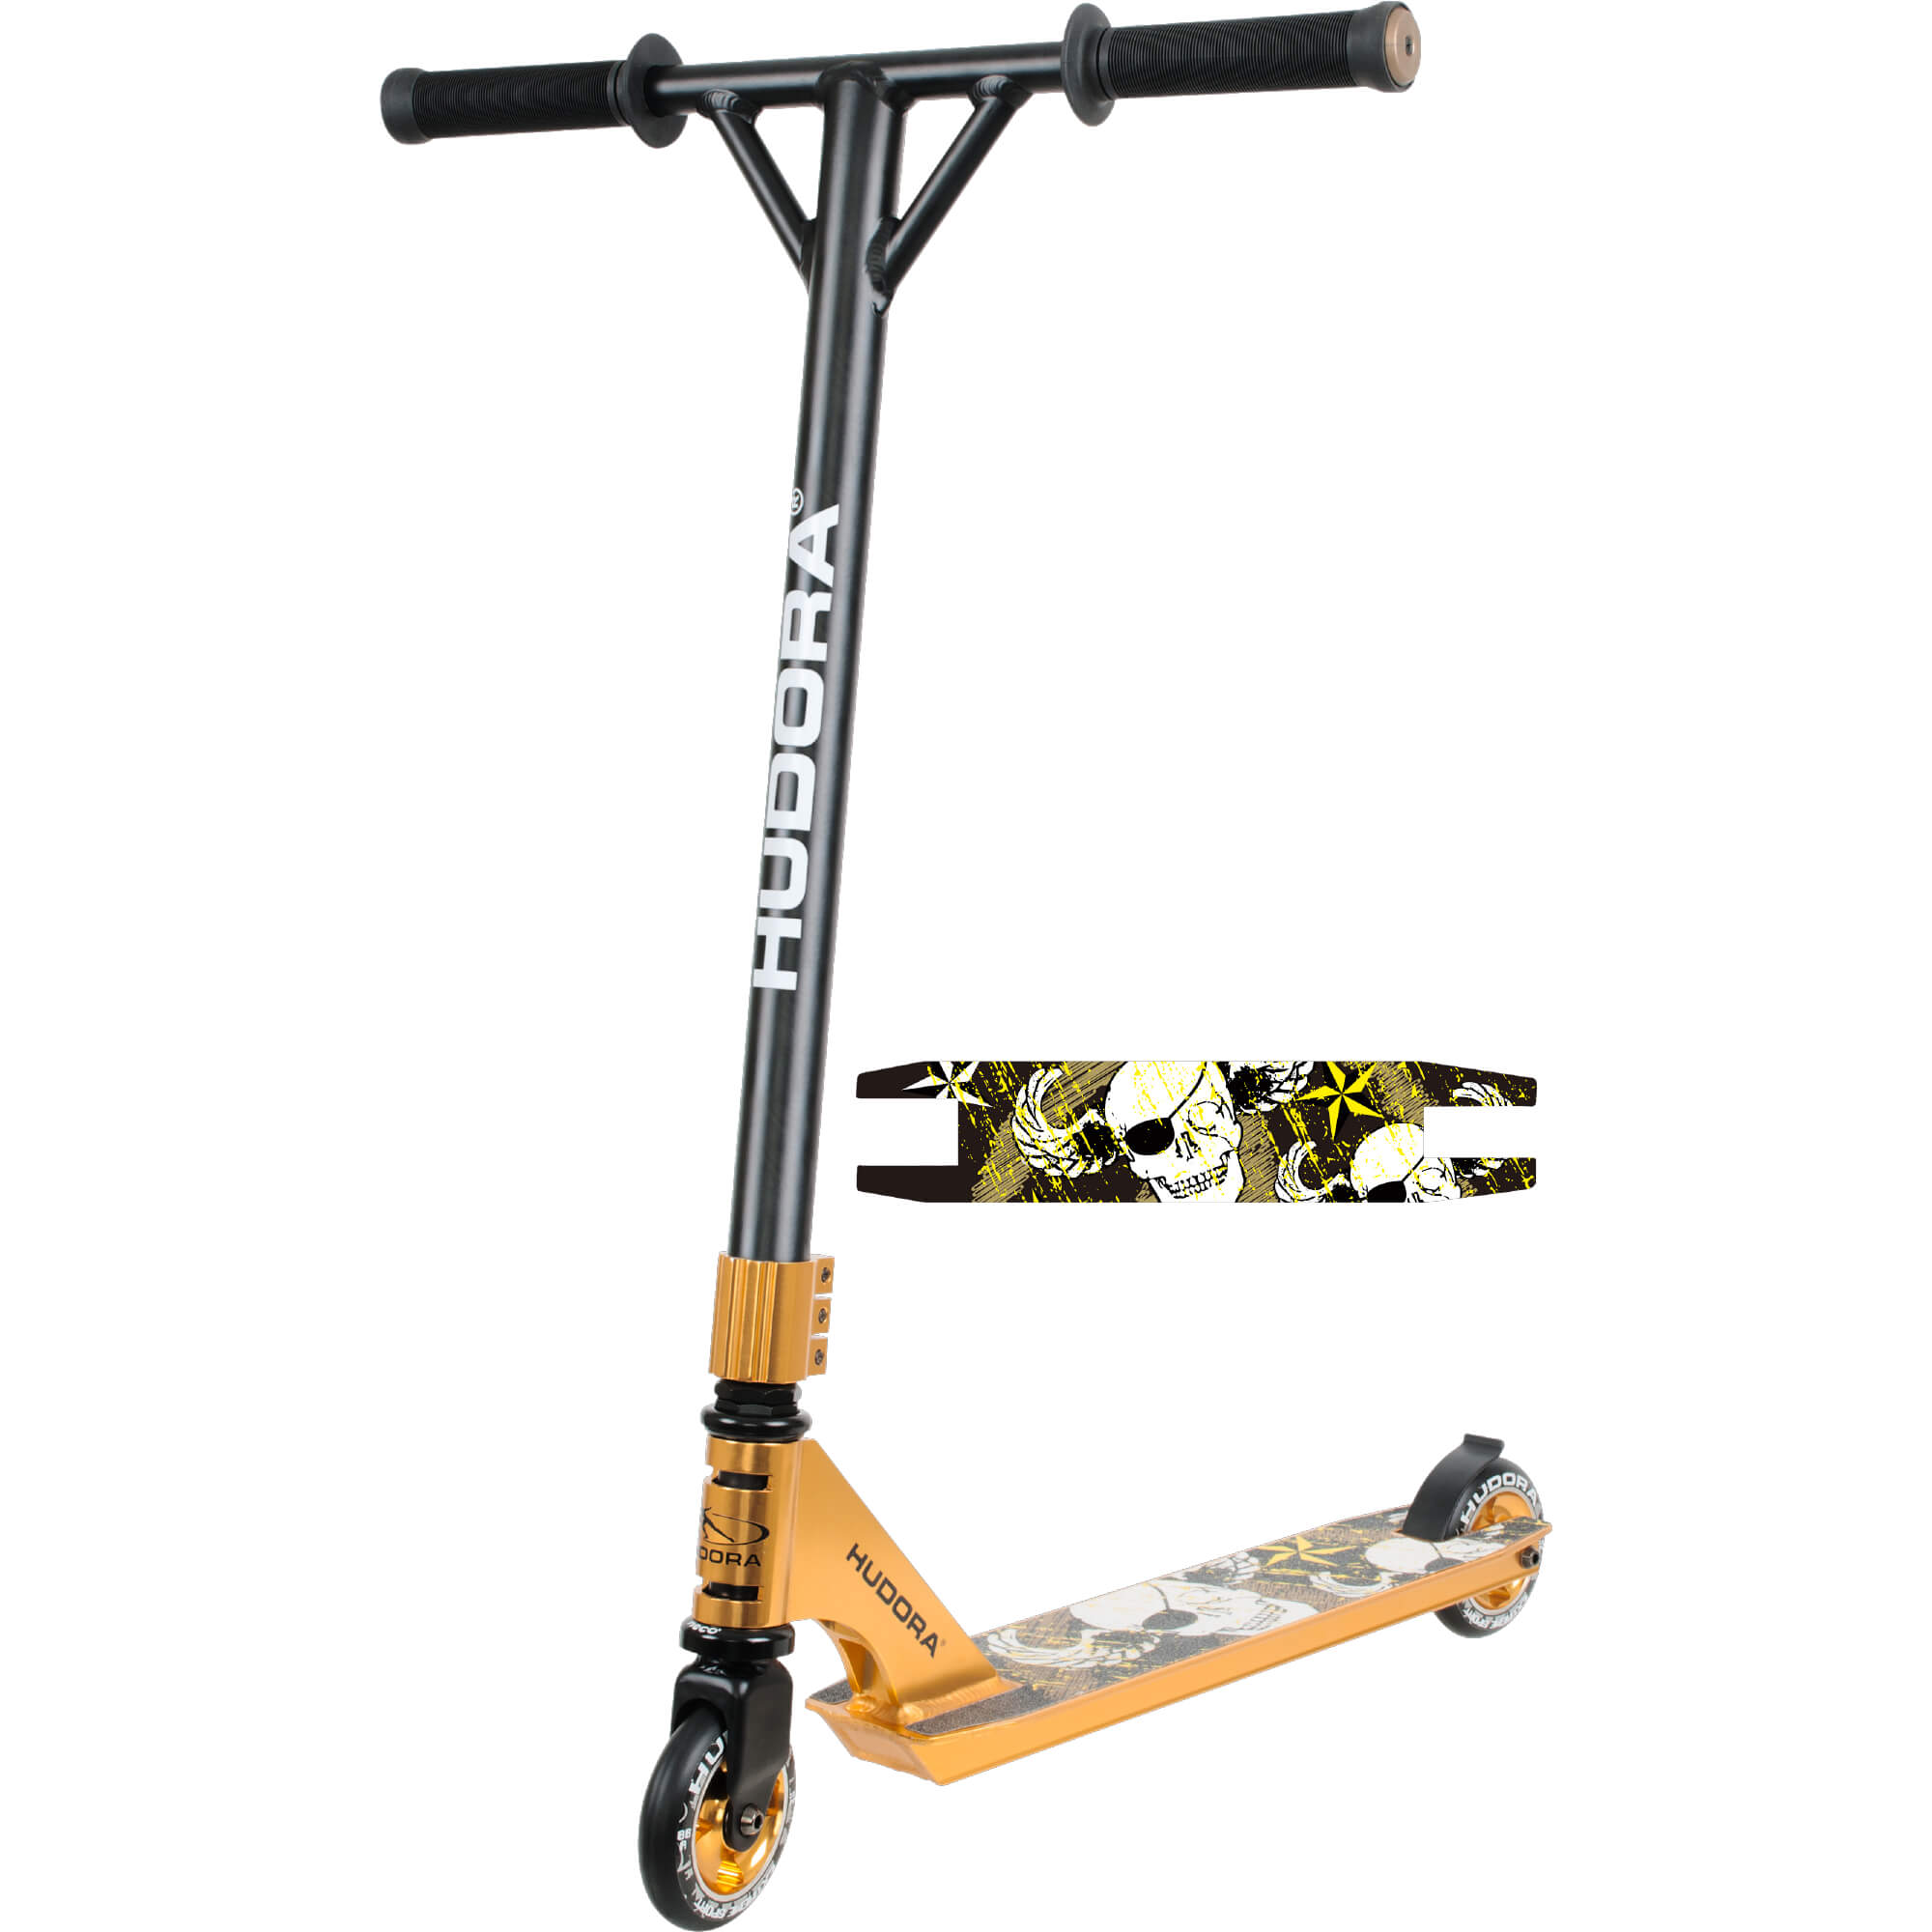 Stunt Scooter XR-25